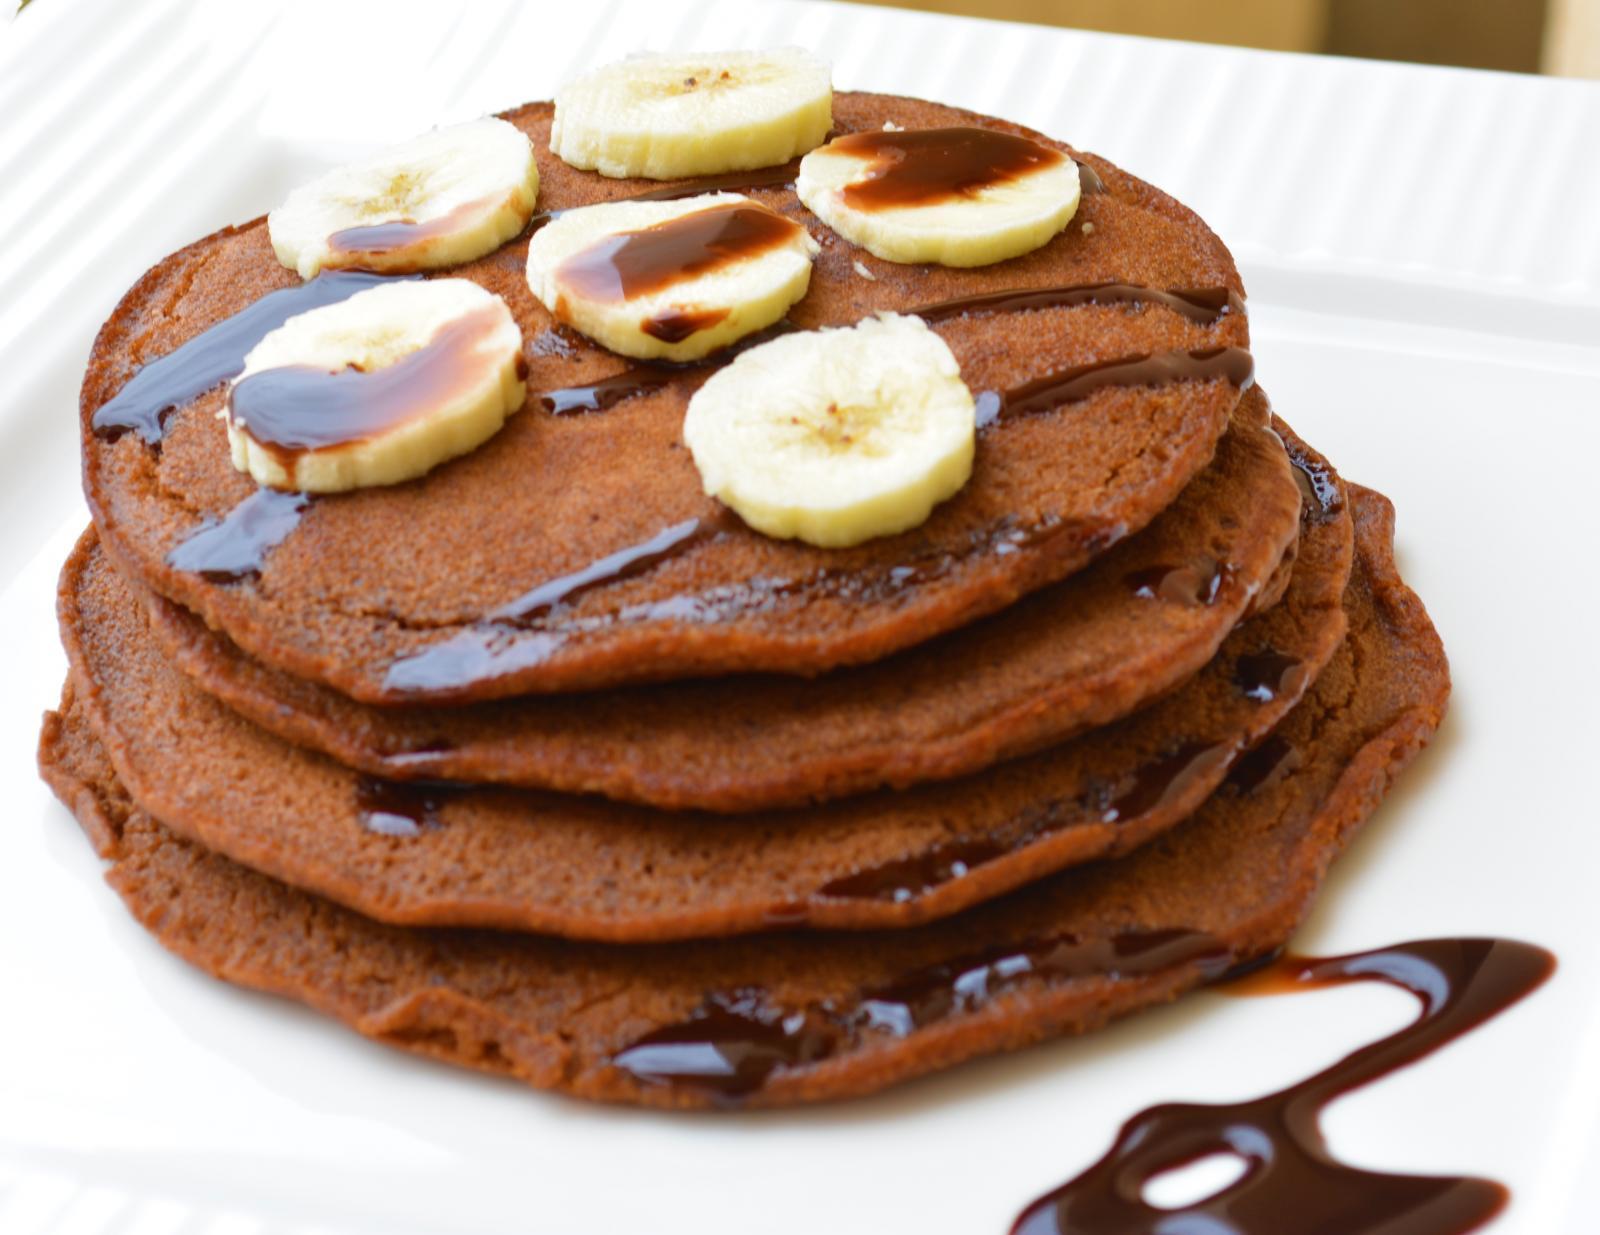 Chocolate Pancakes With Banana Recipe